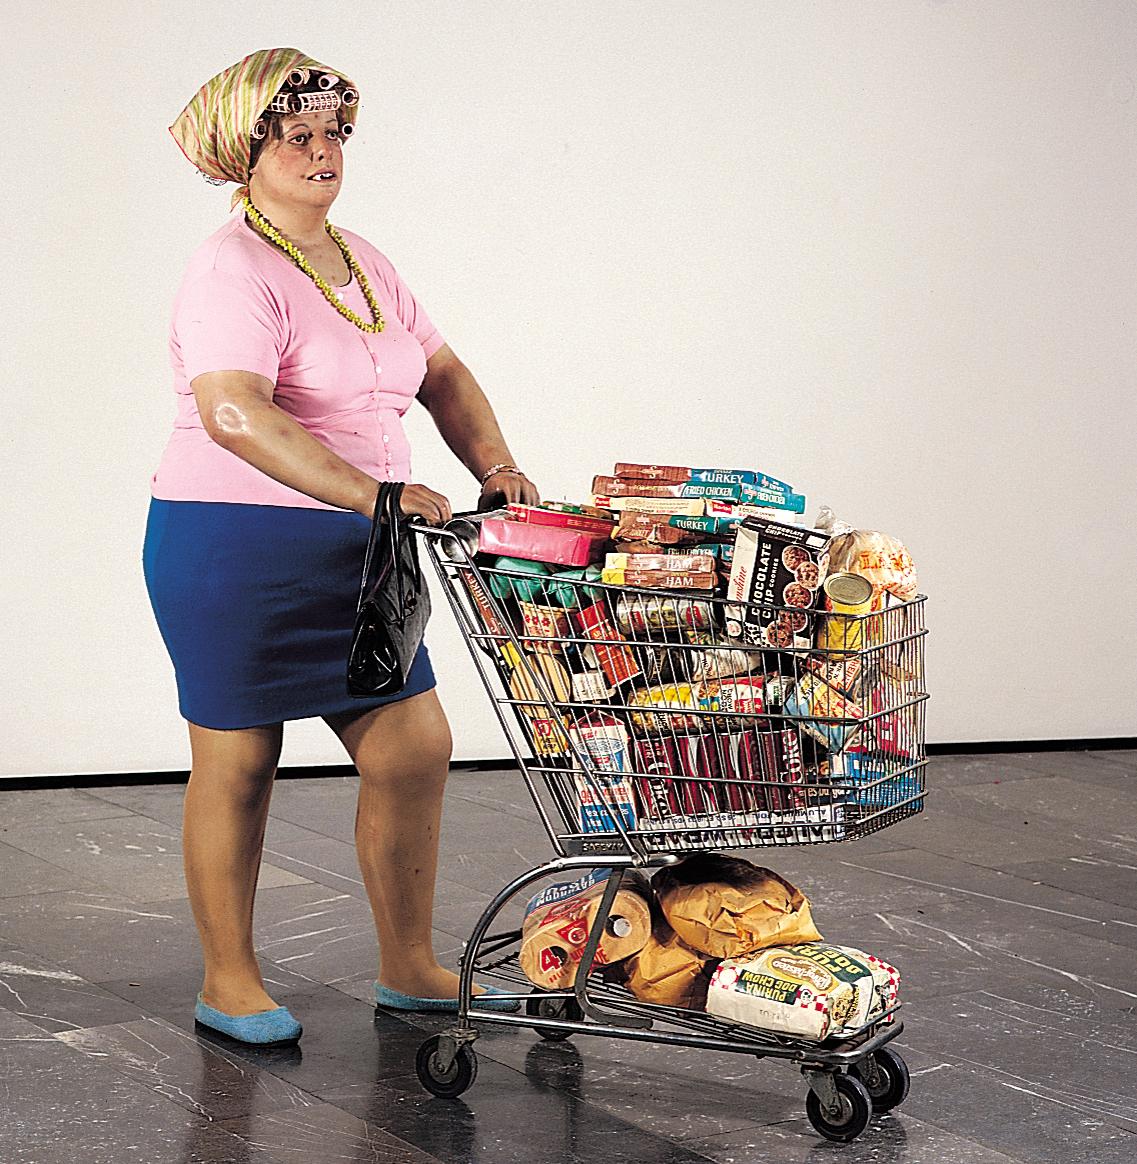 Duane-Hanson-supermarketlady